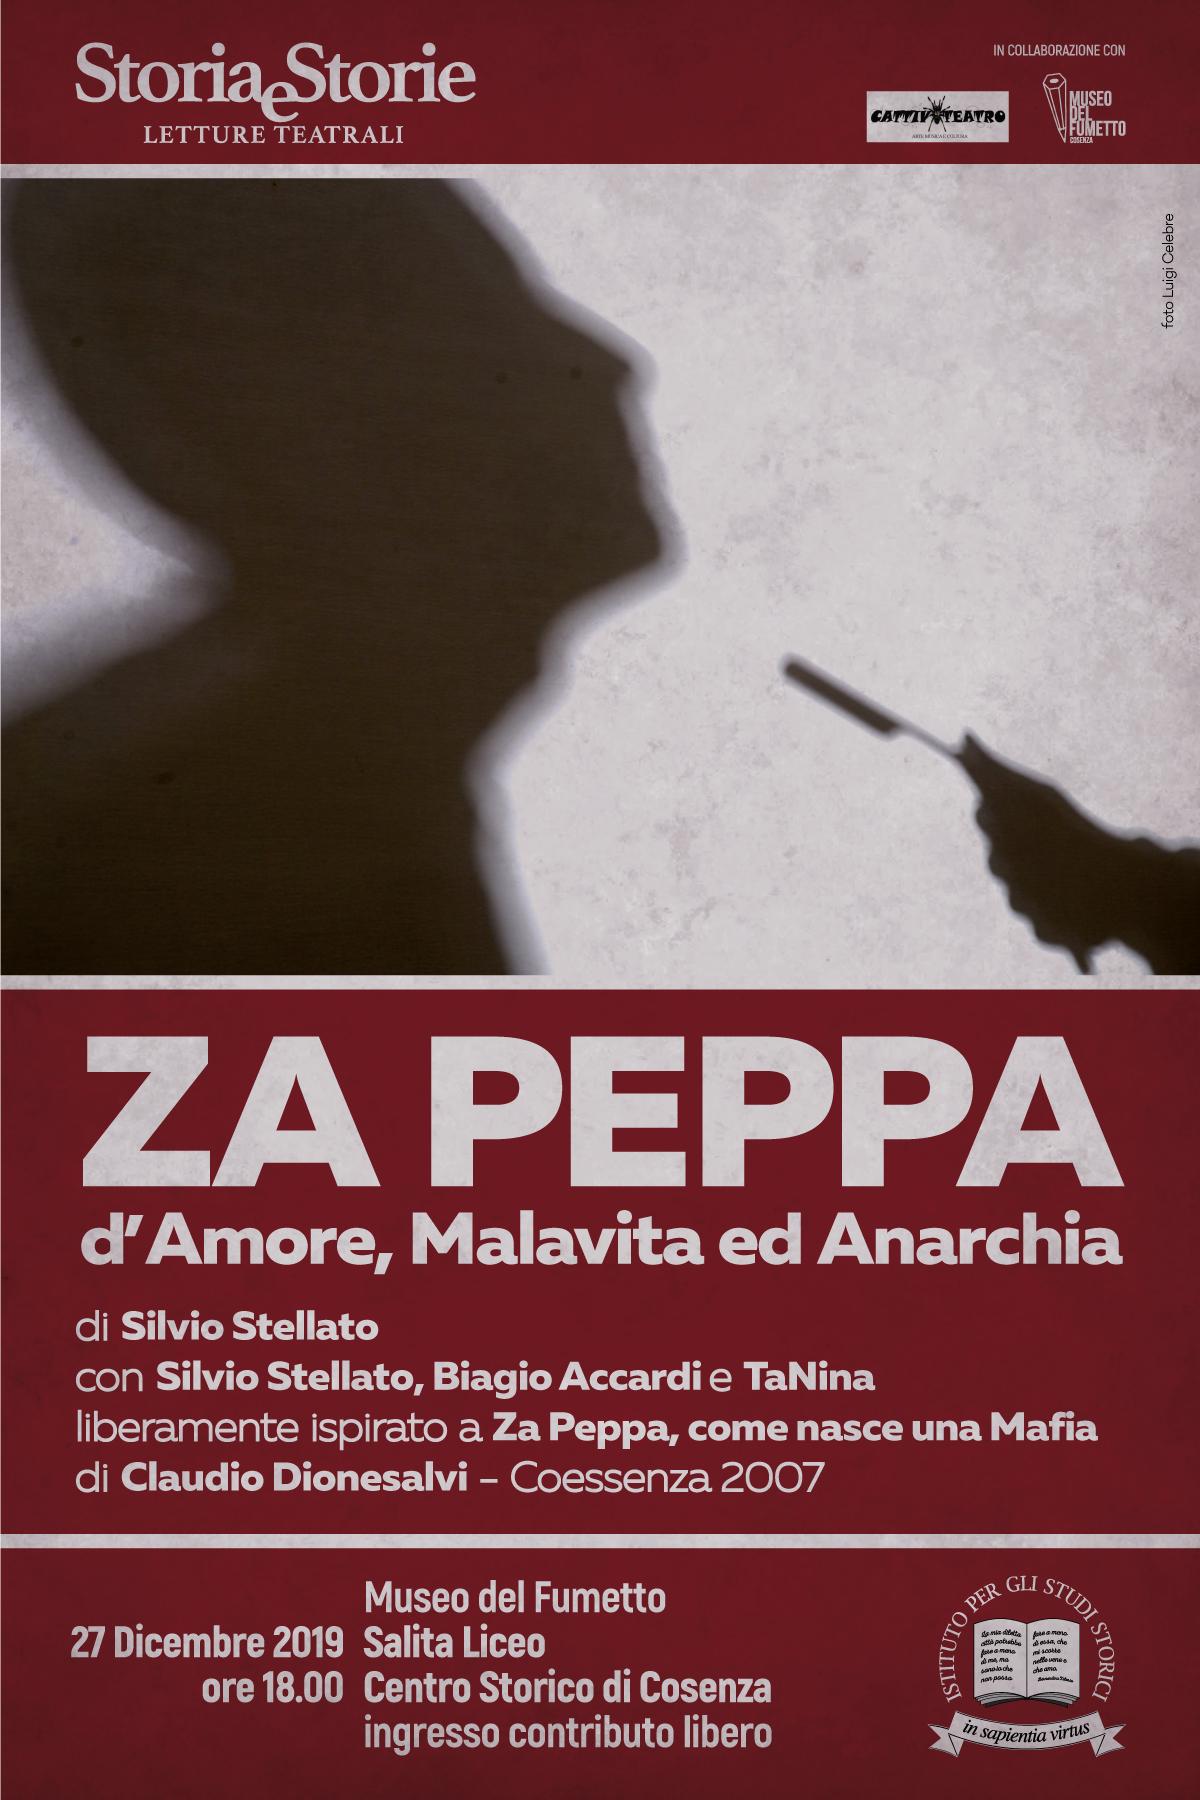 ZA PEPPA – d'Amore, Malavita ed Anarchia